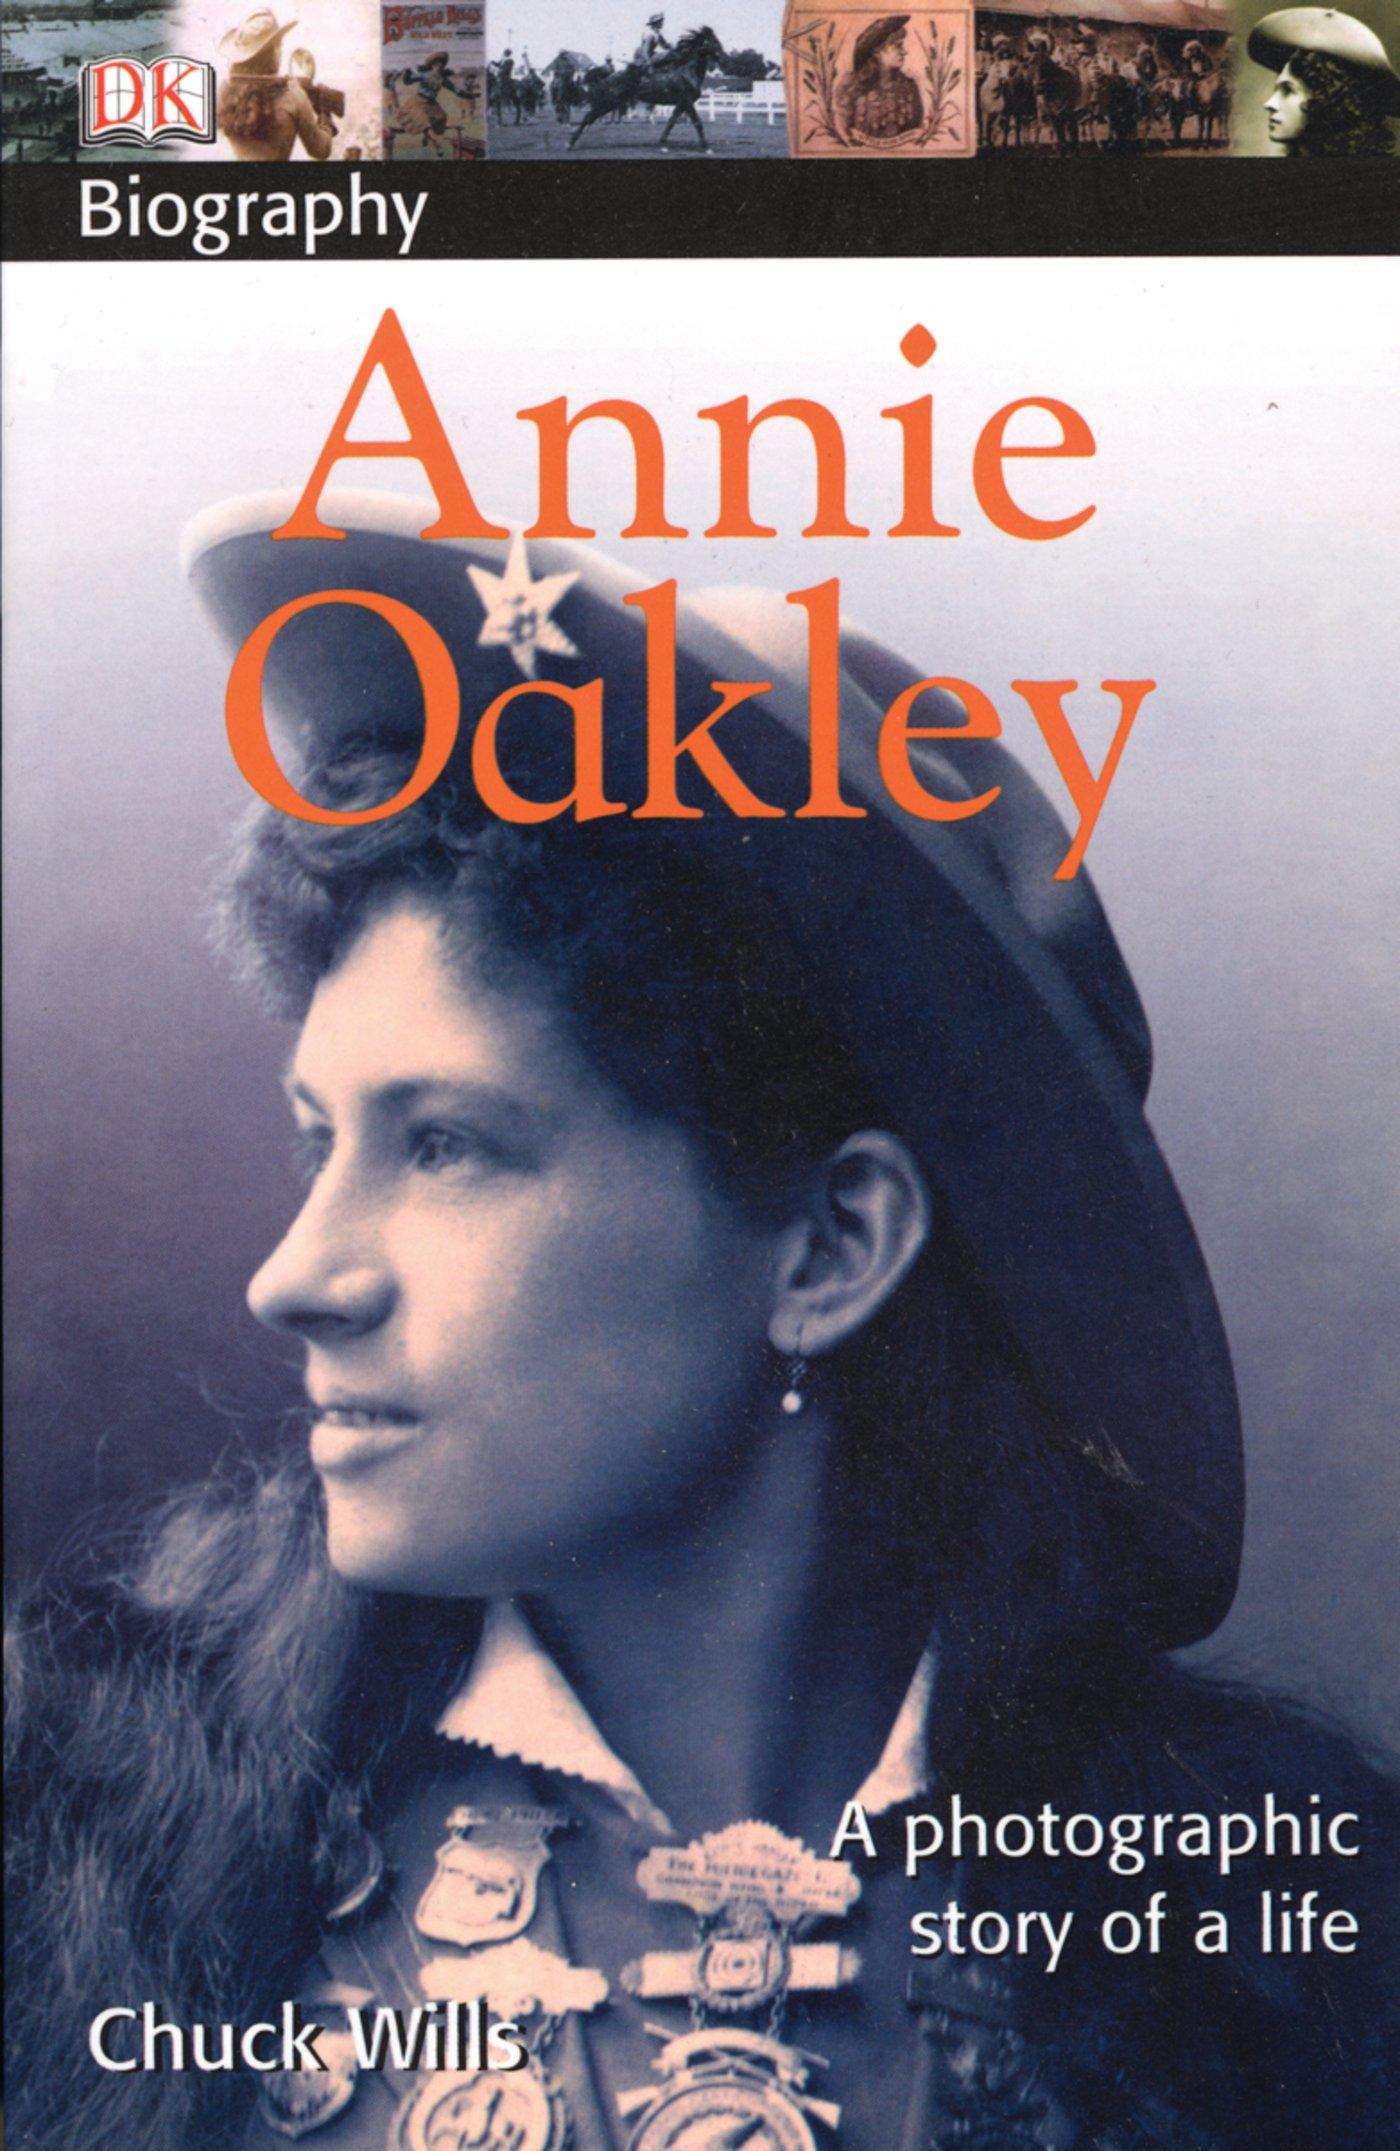 Download DK Biography: Annie Oakley ebook